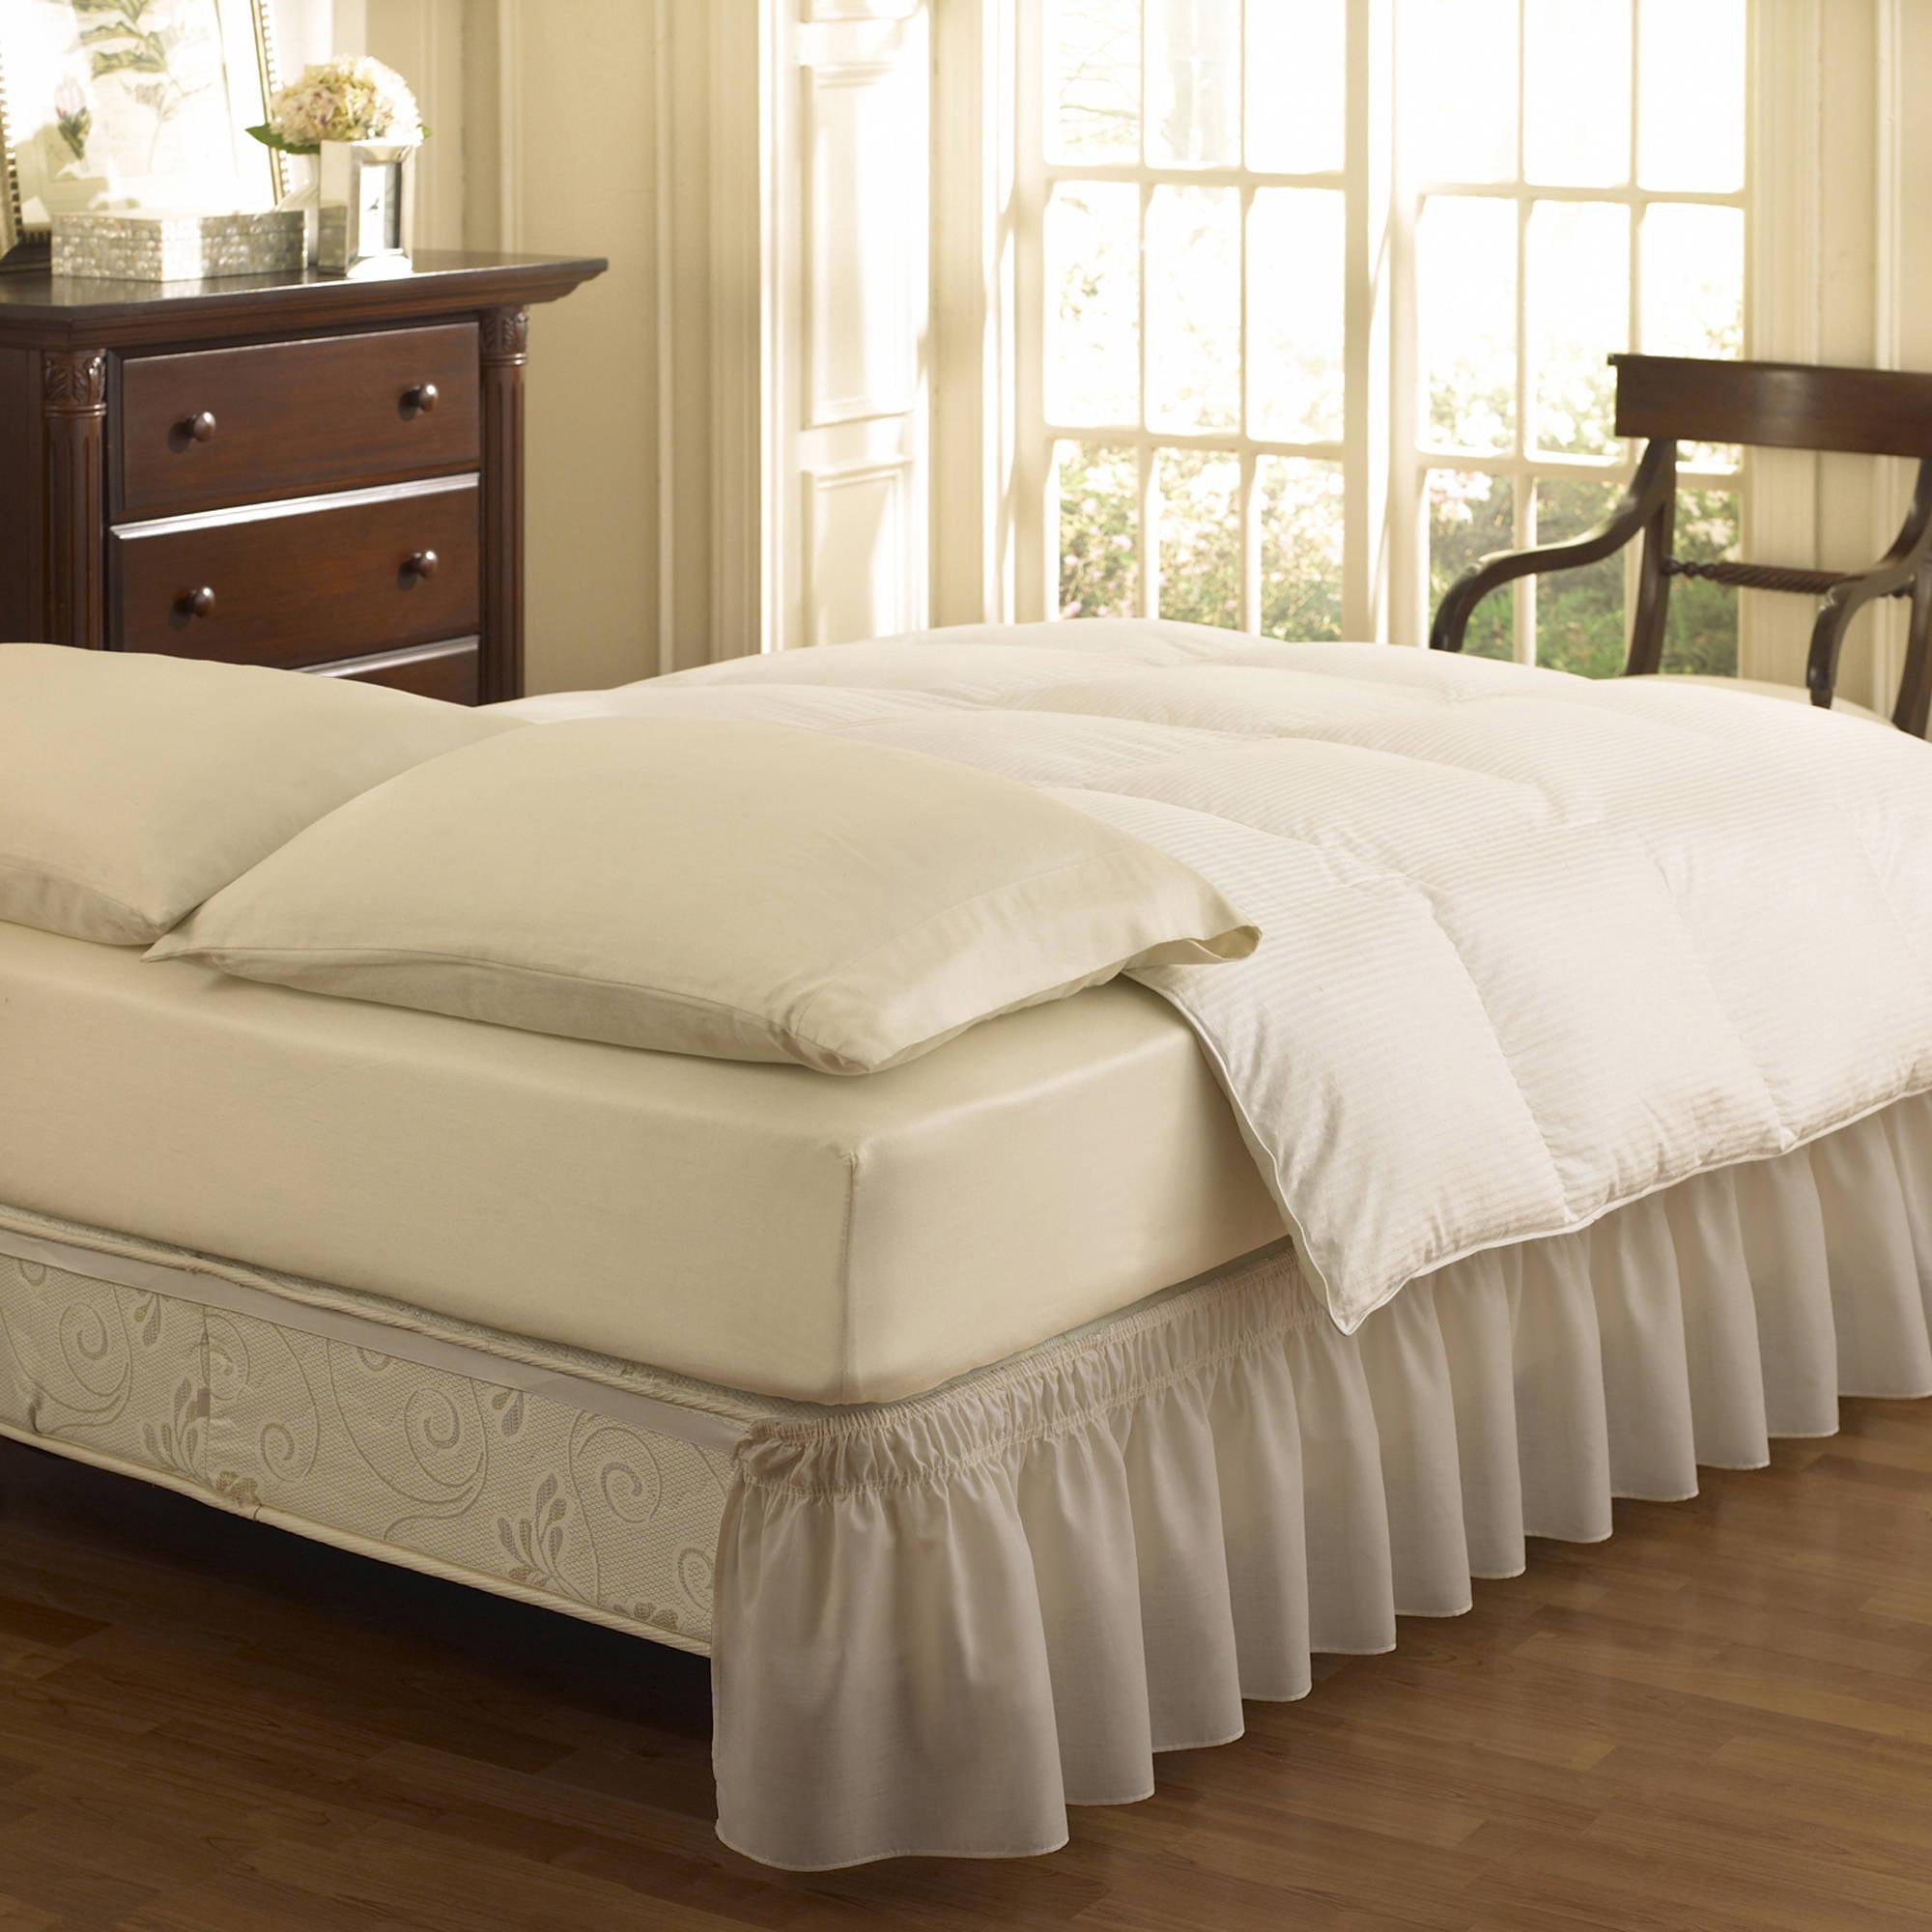 EasyFit Wrap Around Solid Ruffled Bed Skirt, Grey